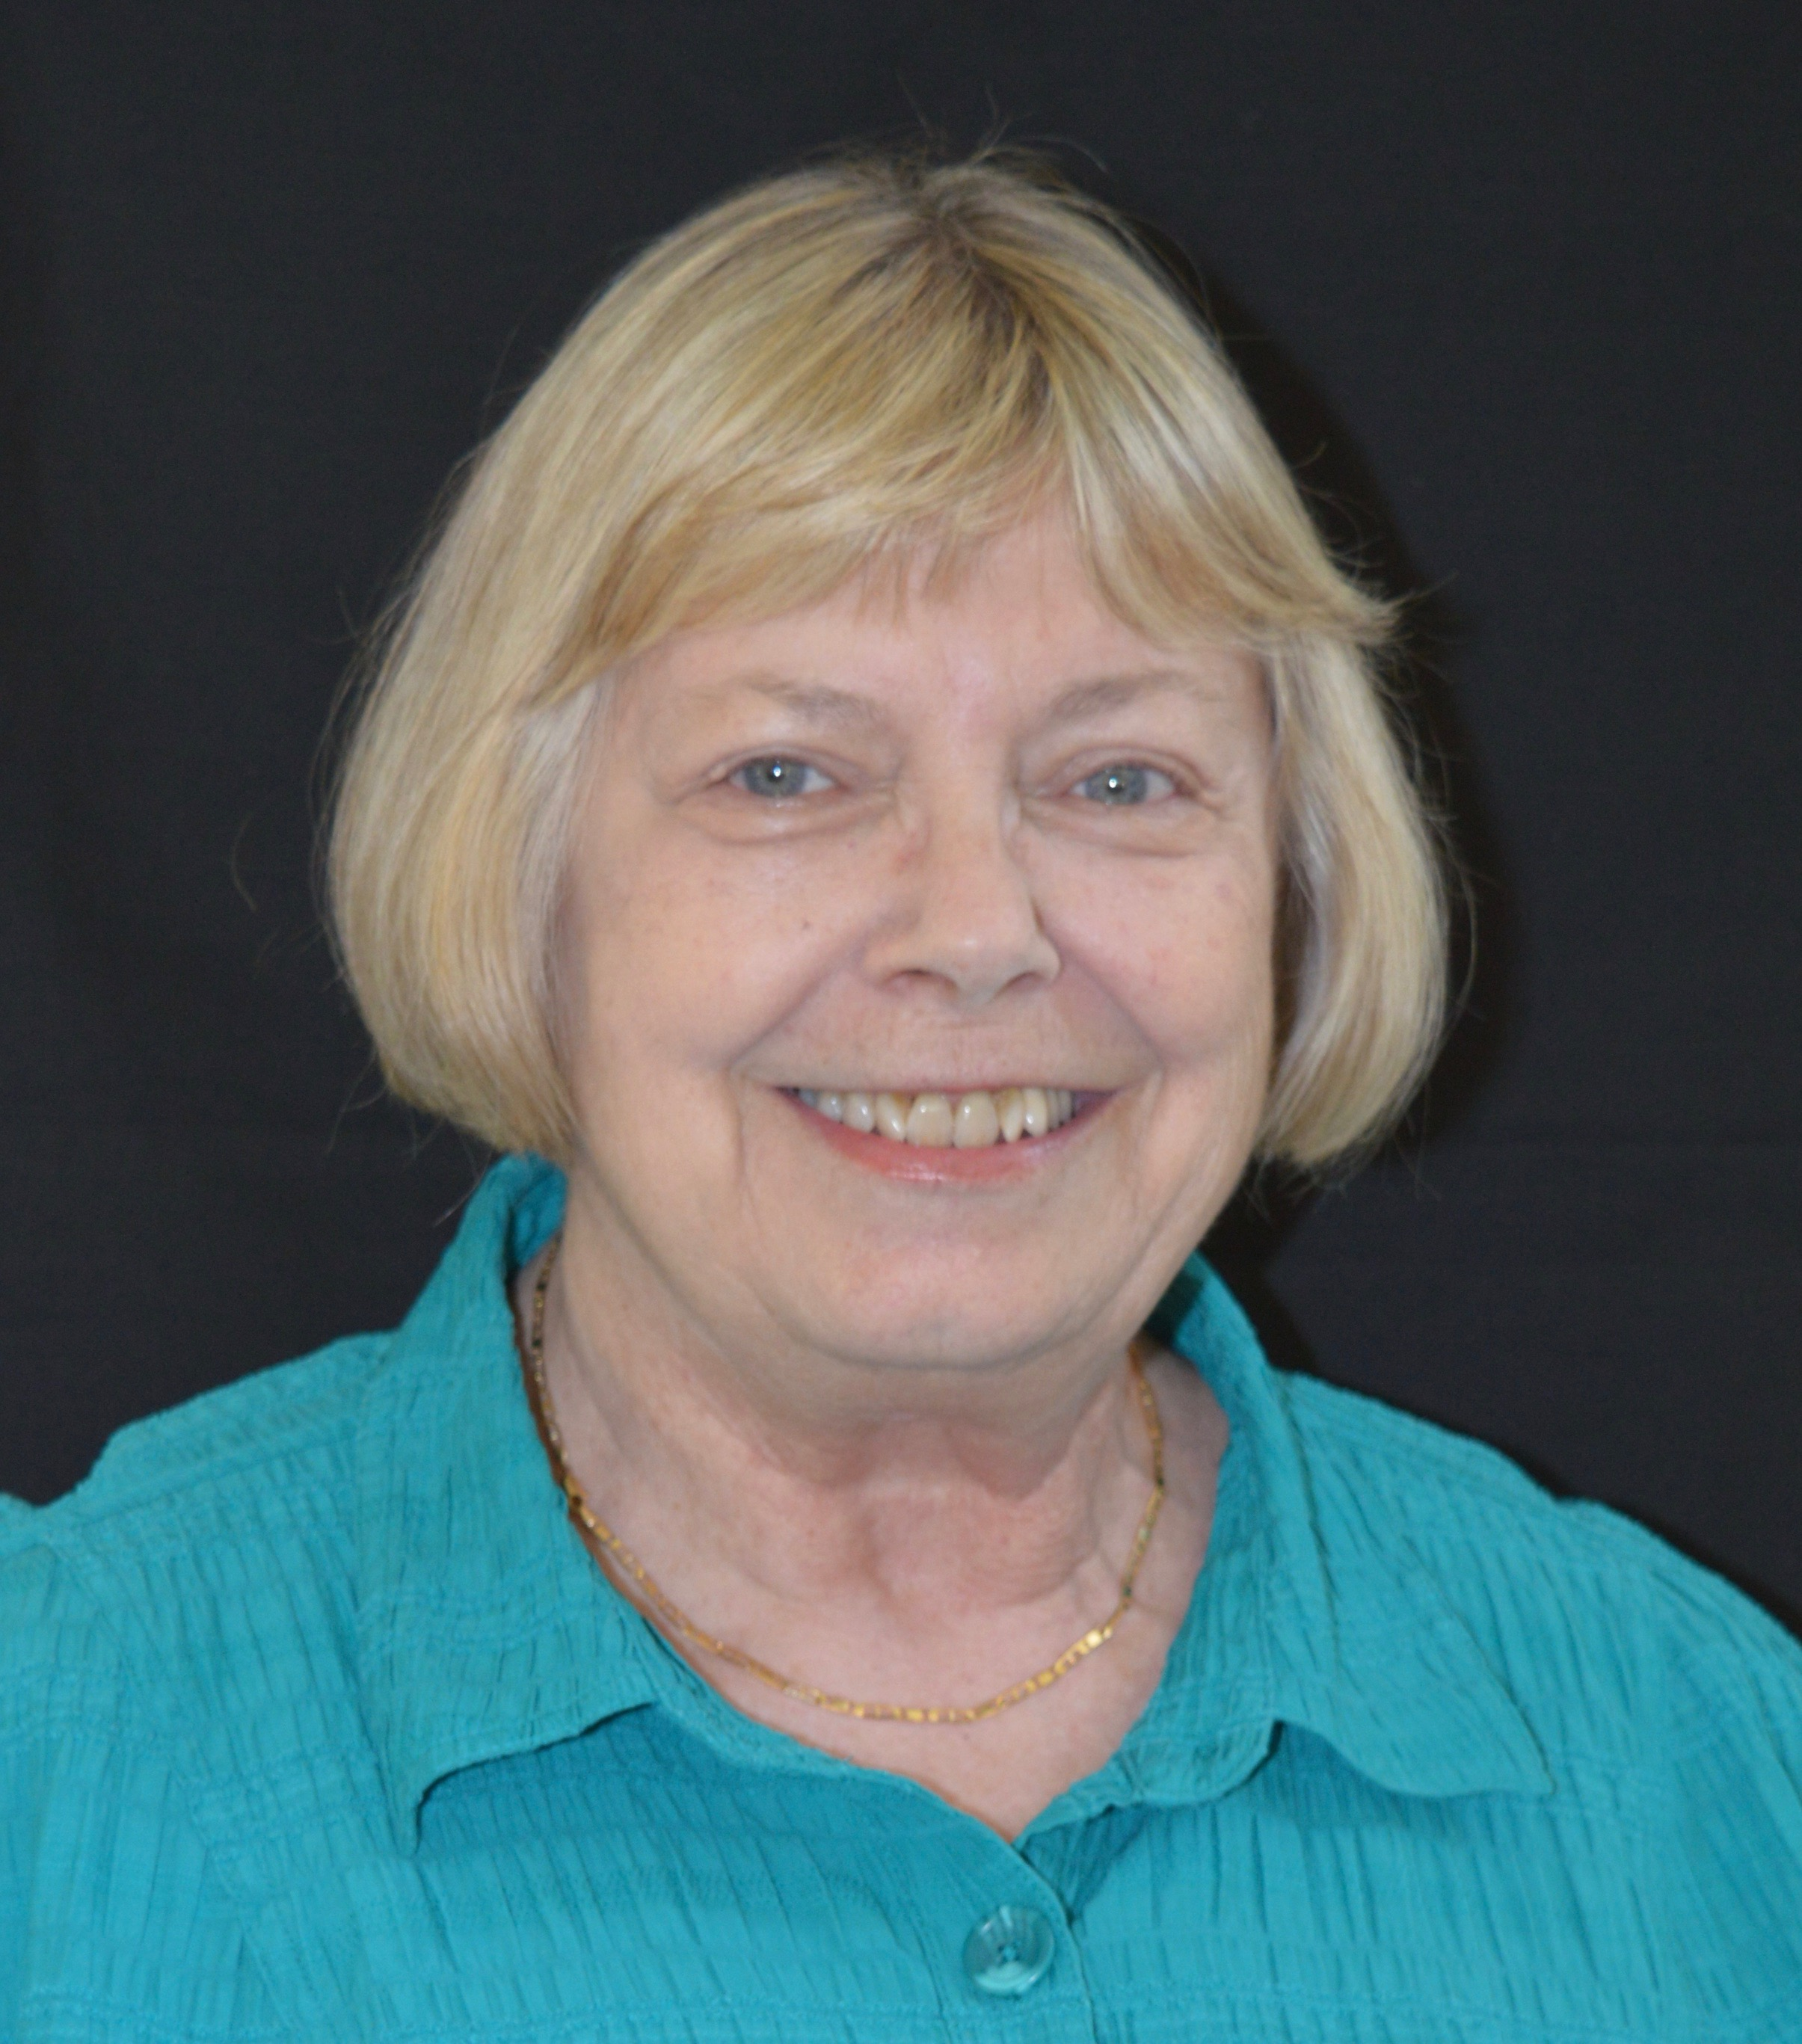 Linda Delarosa - Office Manager